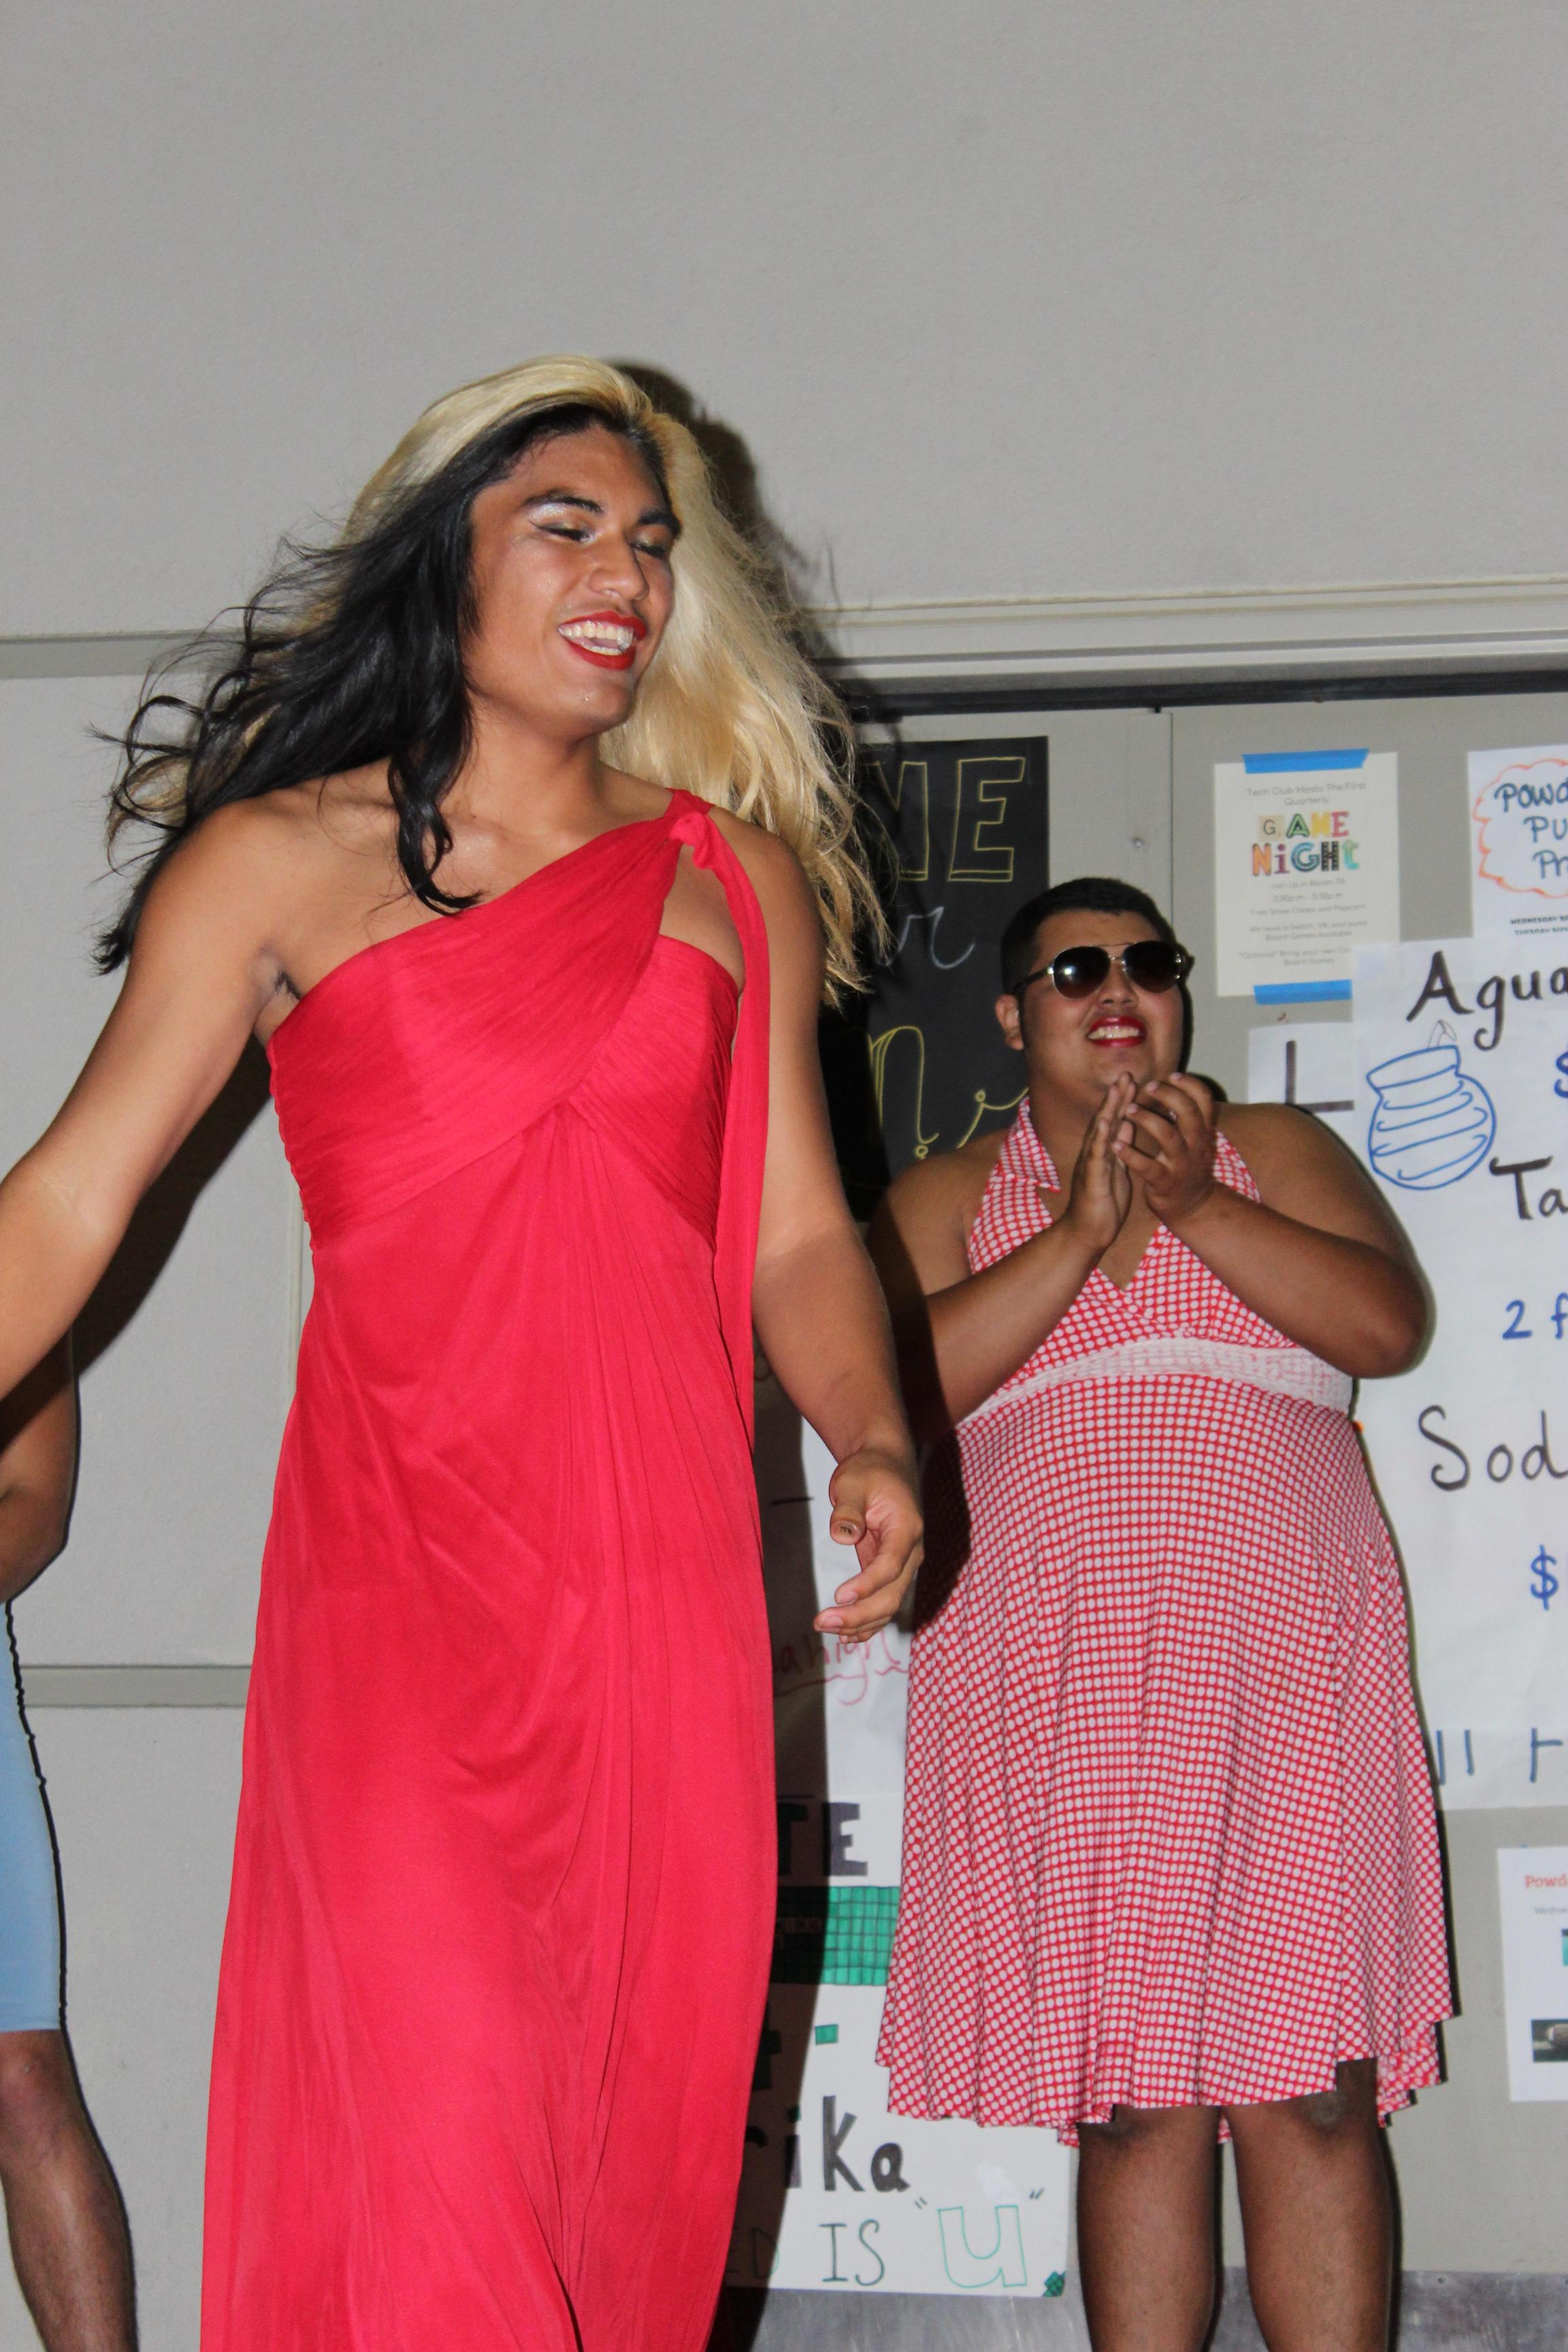 Students having fun at Mr. Tailgate